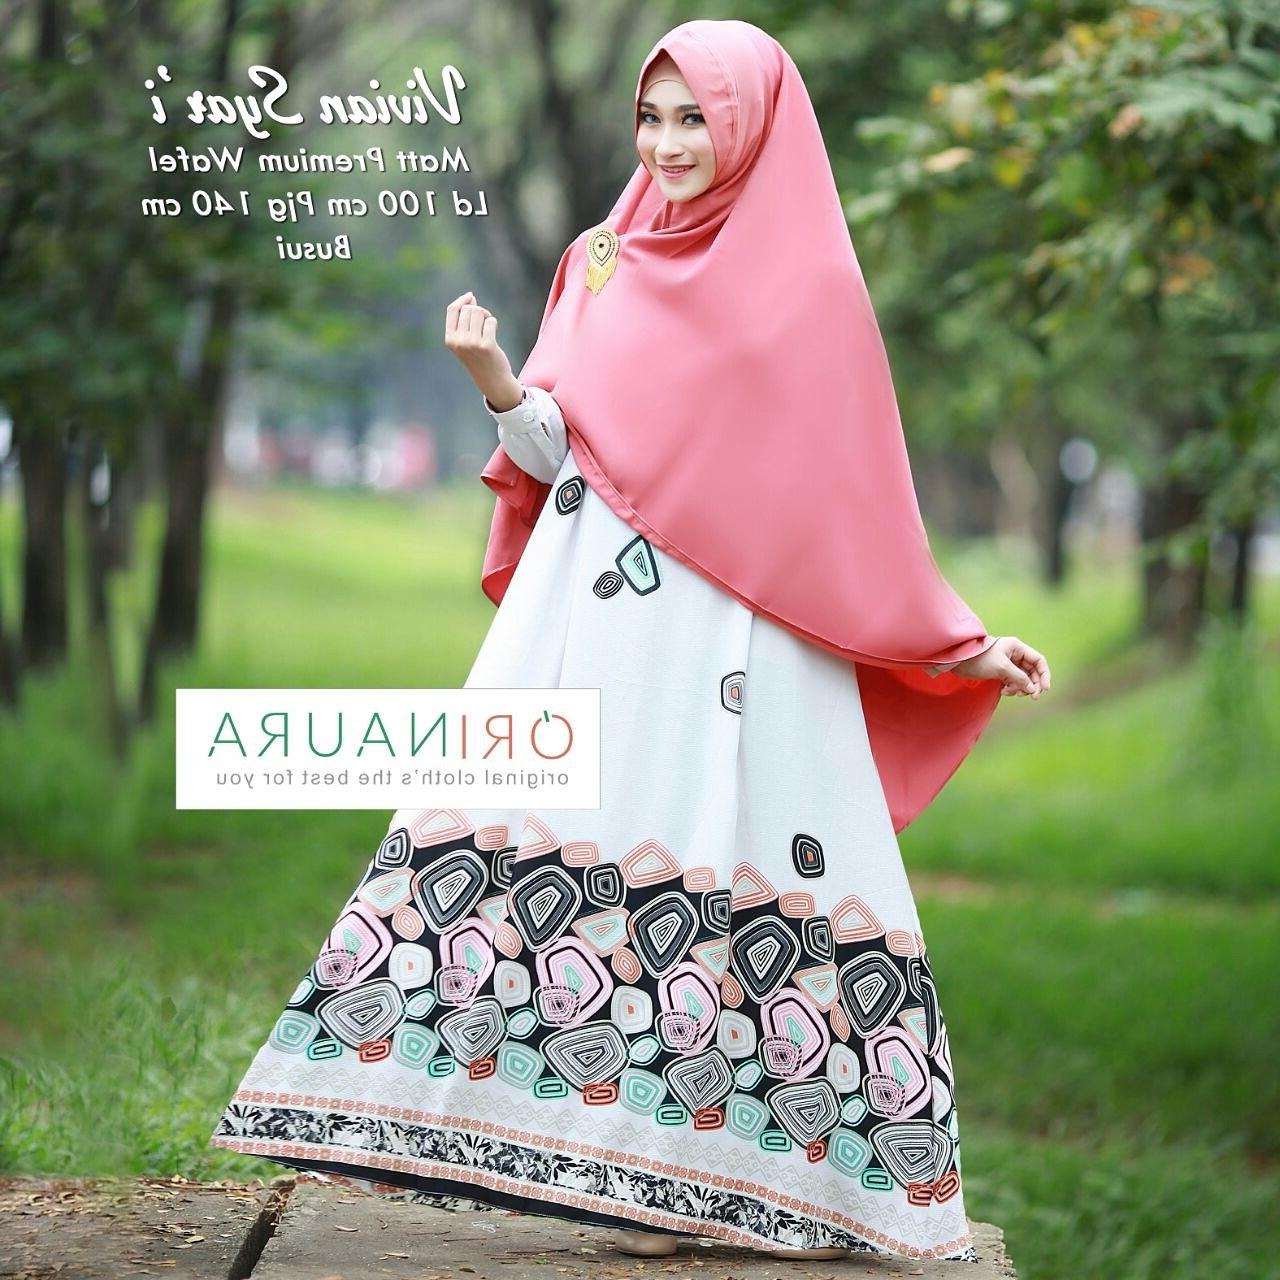 Ide Fashion Muslim Terbaru Gdd0 Baju Hijab Modern Terbaru Style Remaja Sekarang